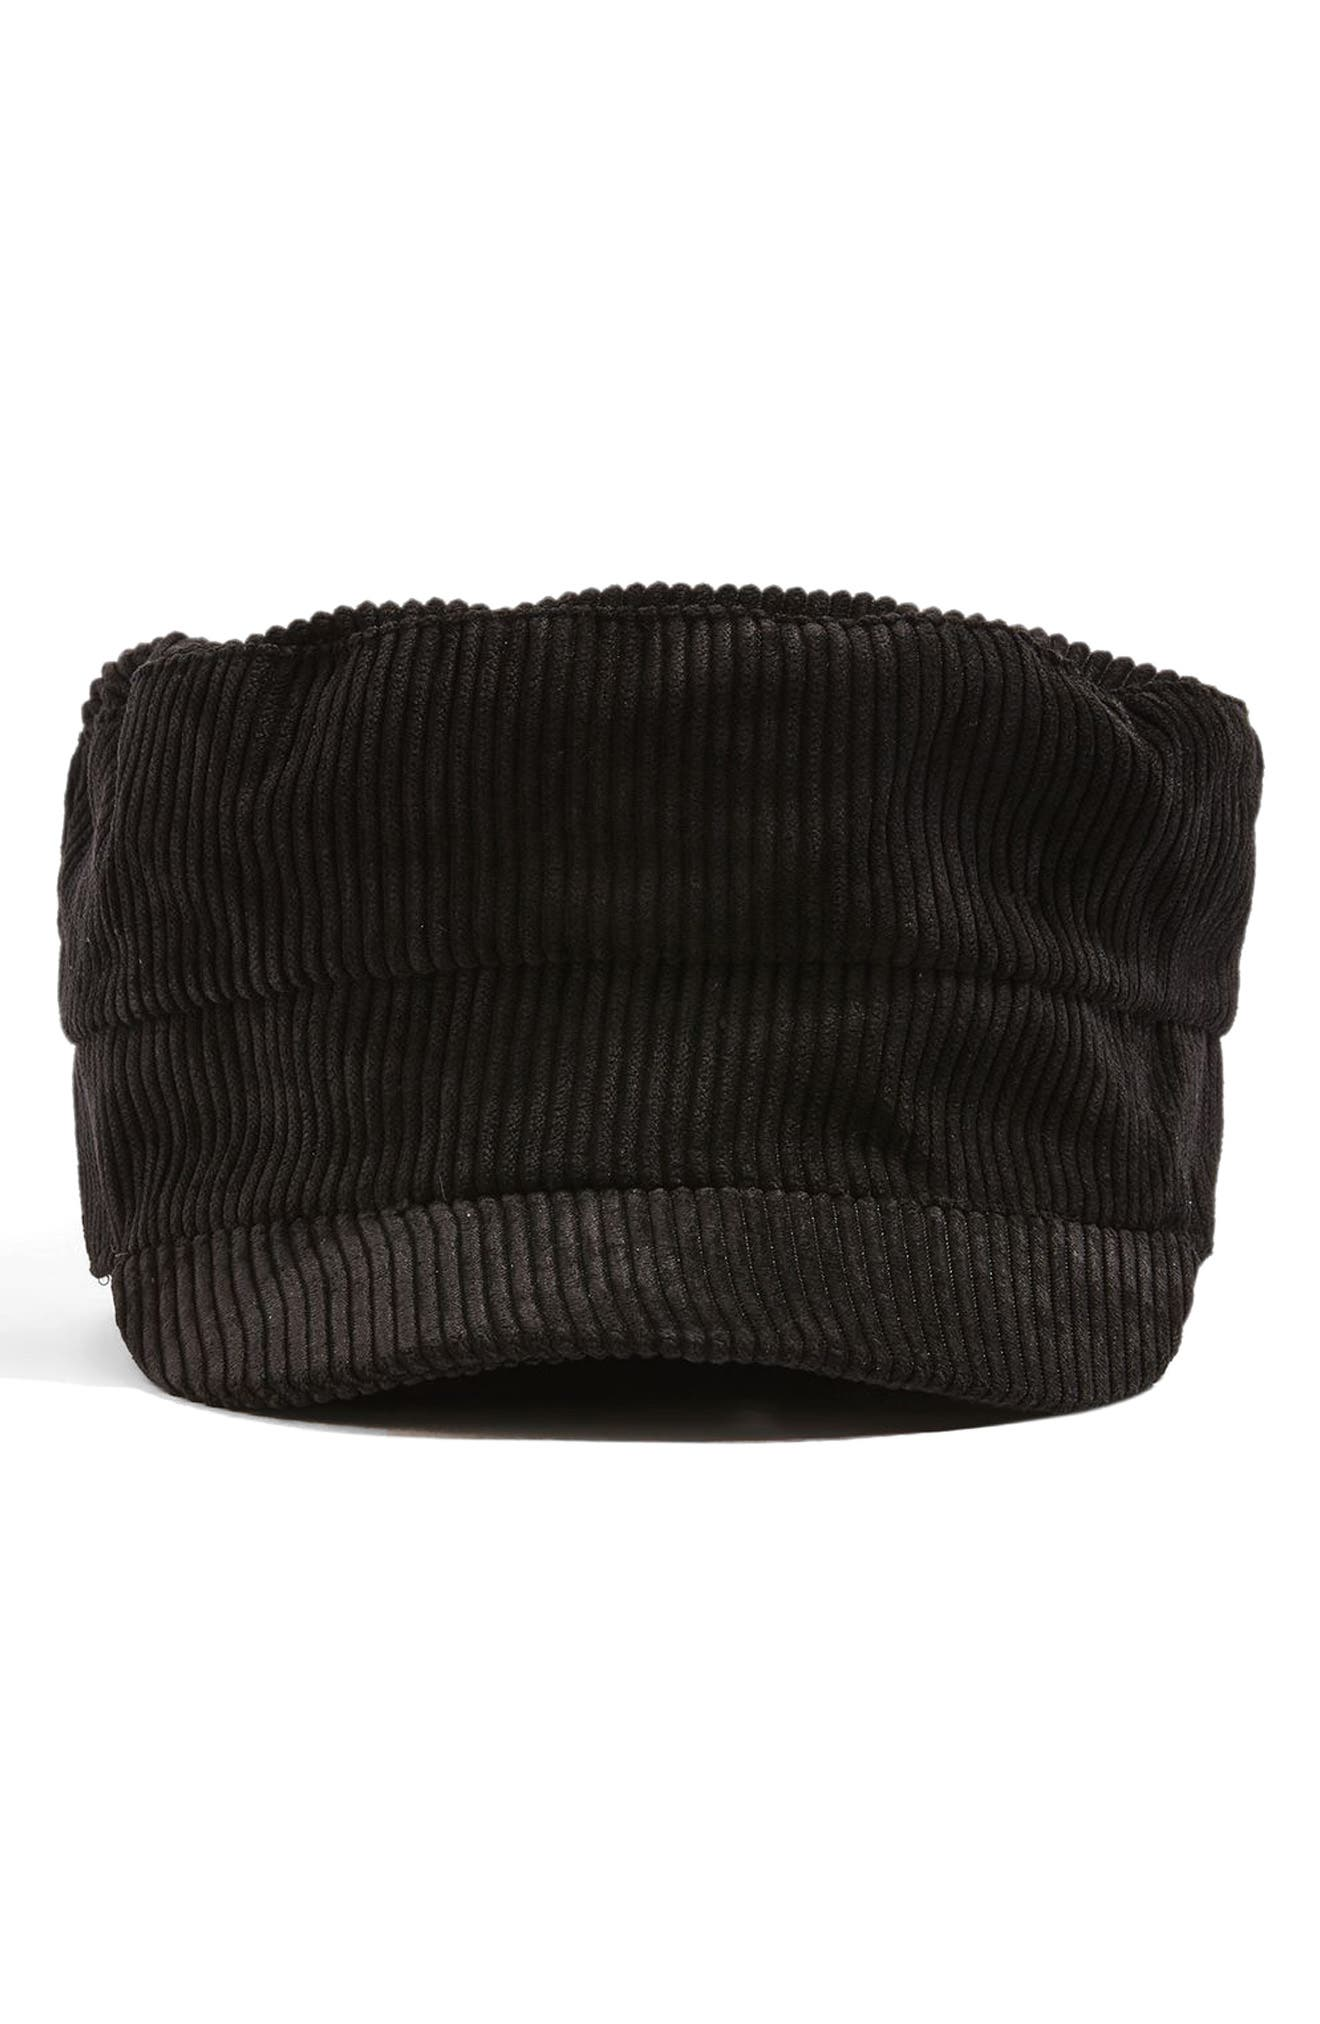 Topshop Corduroy Baker Boy Hat